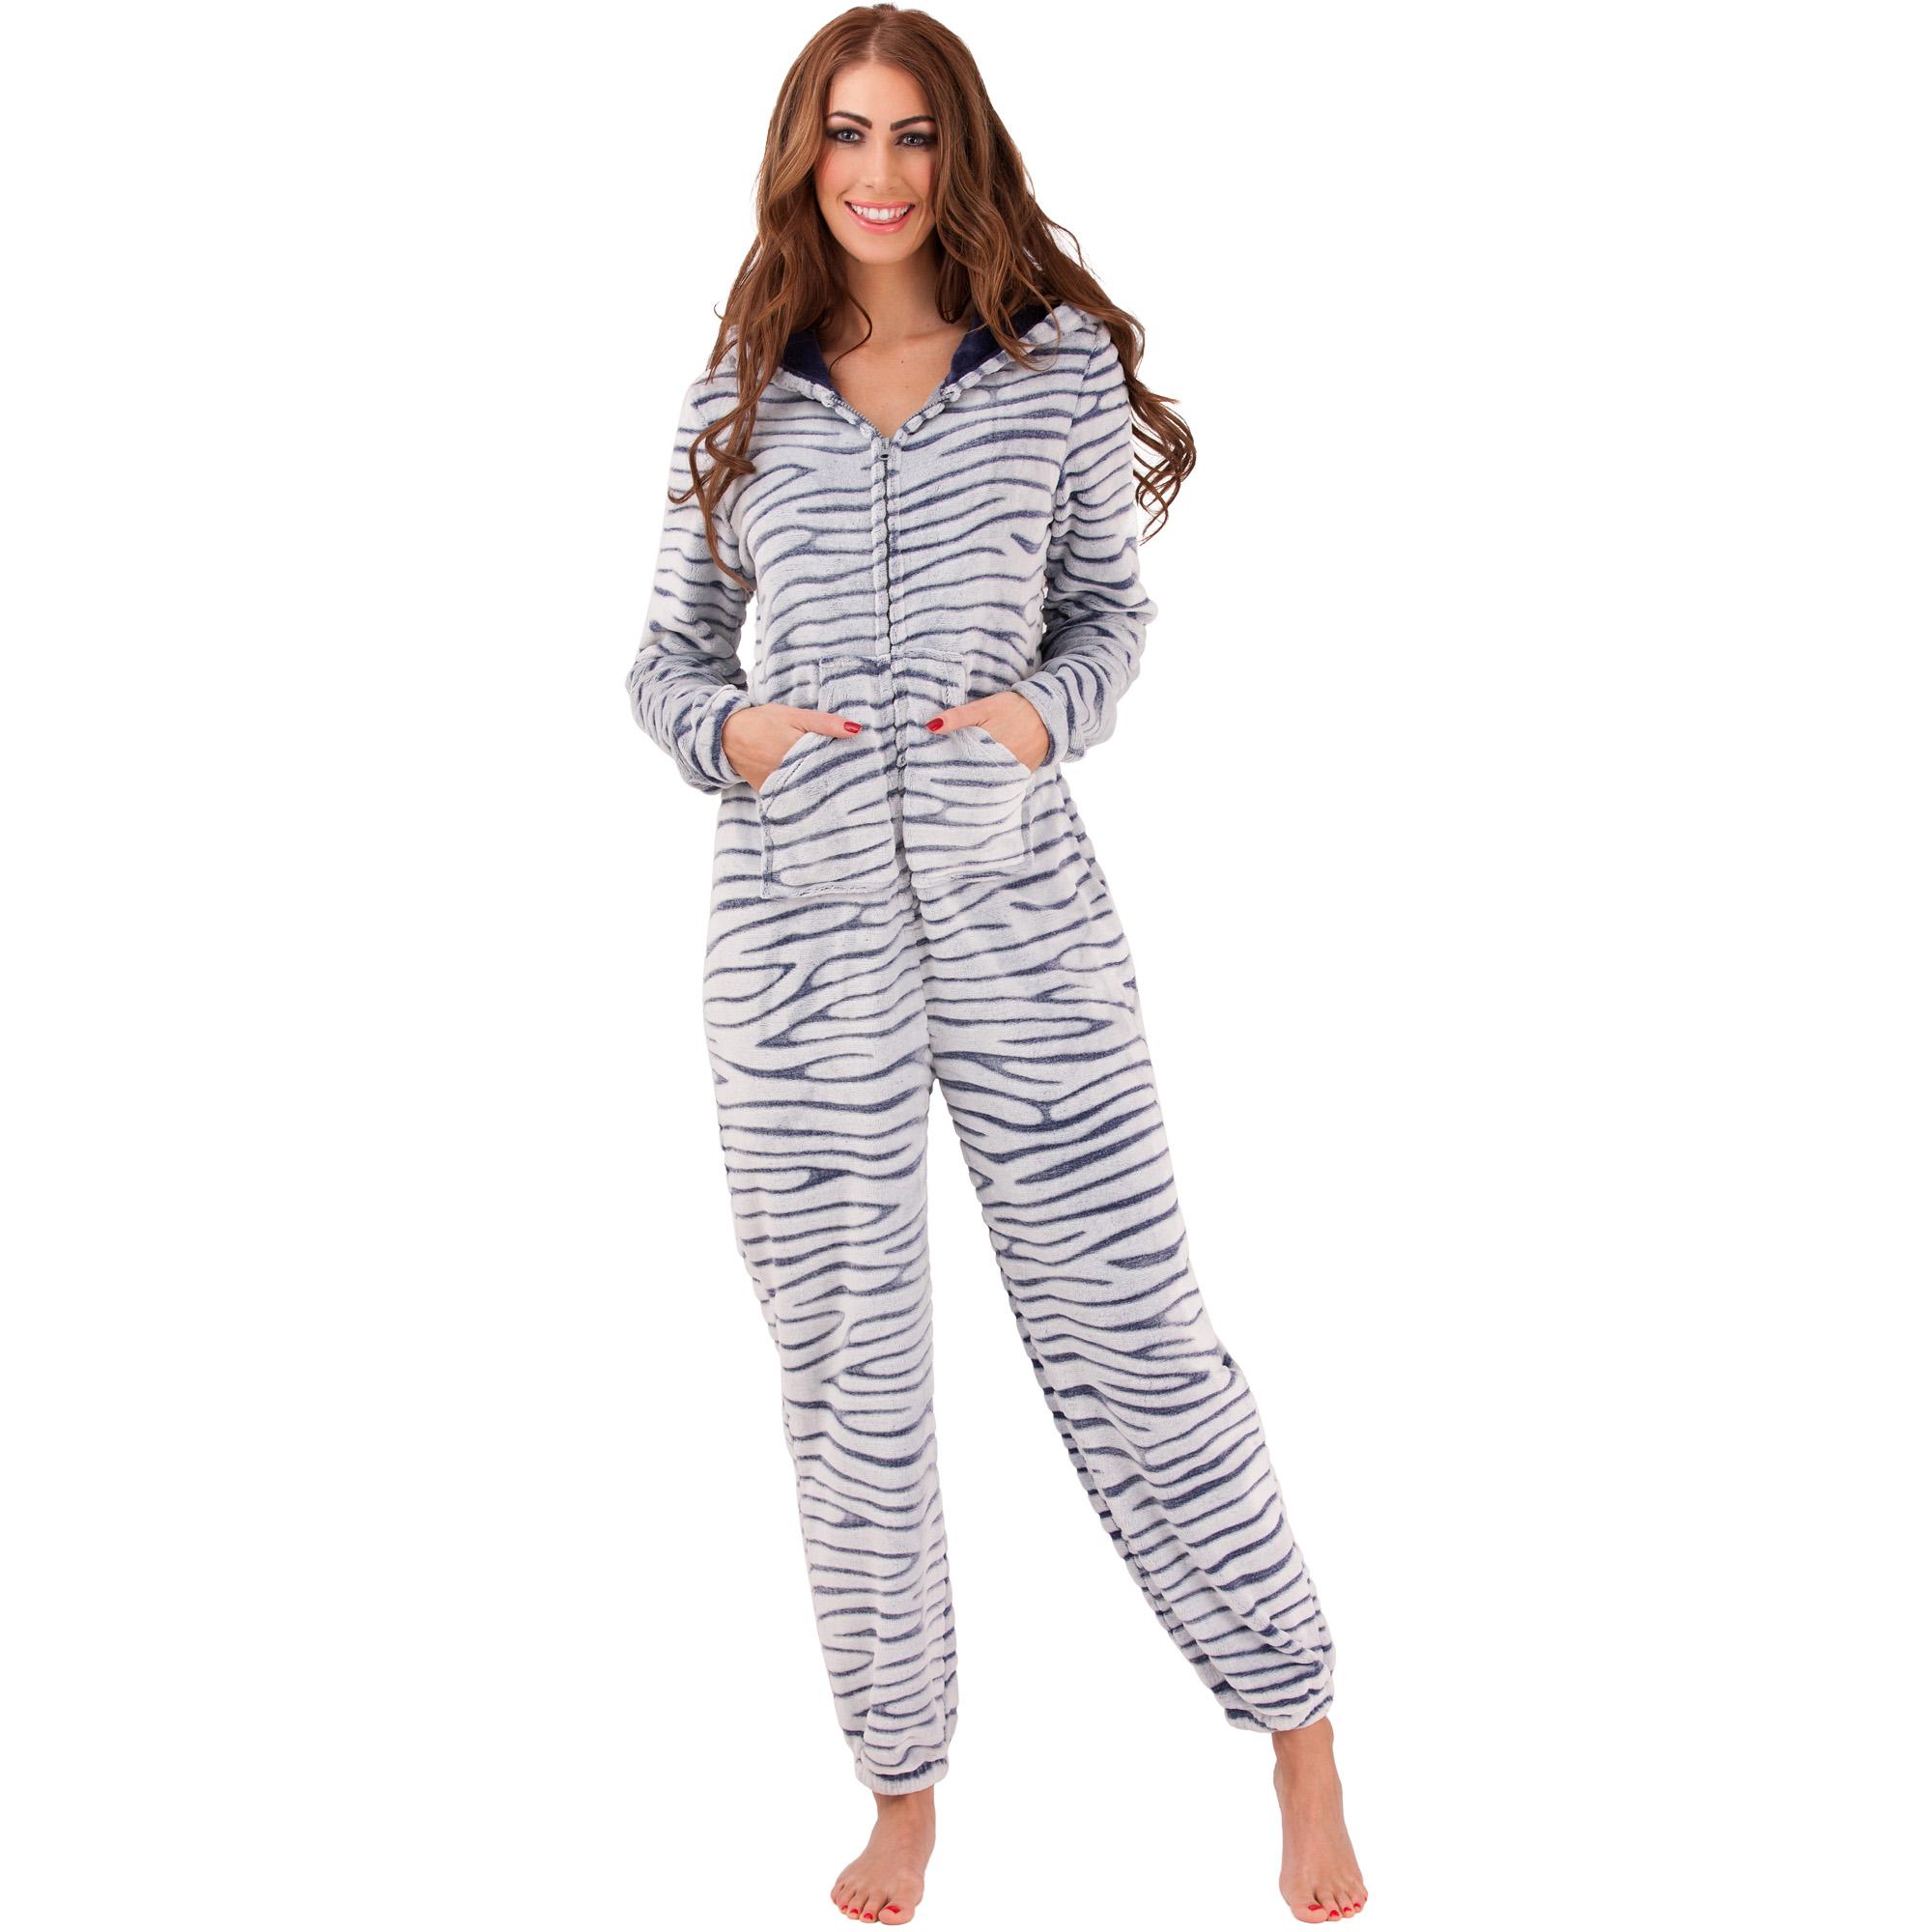 damen jumpsuit overall strampler pyjama einteiler onesie. Black Bedroom Furniture Sets. Home Design Ideas